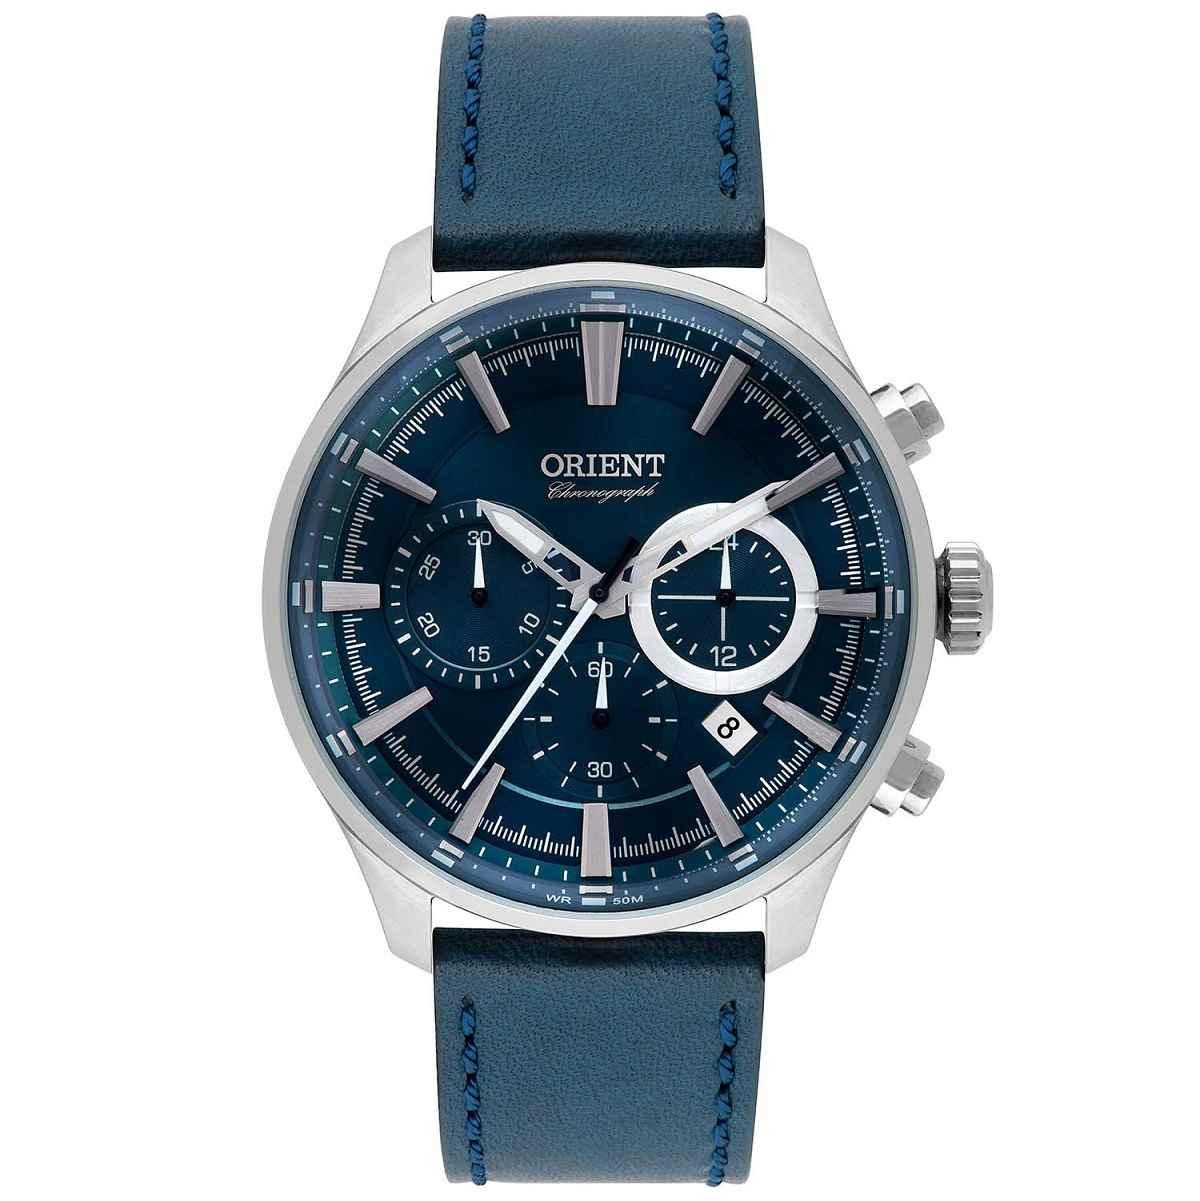 Relógio Orient Masculino Azul Pulseira de Couro MBSCC051 D1DX